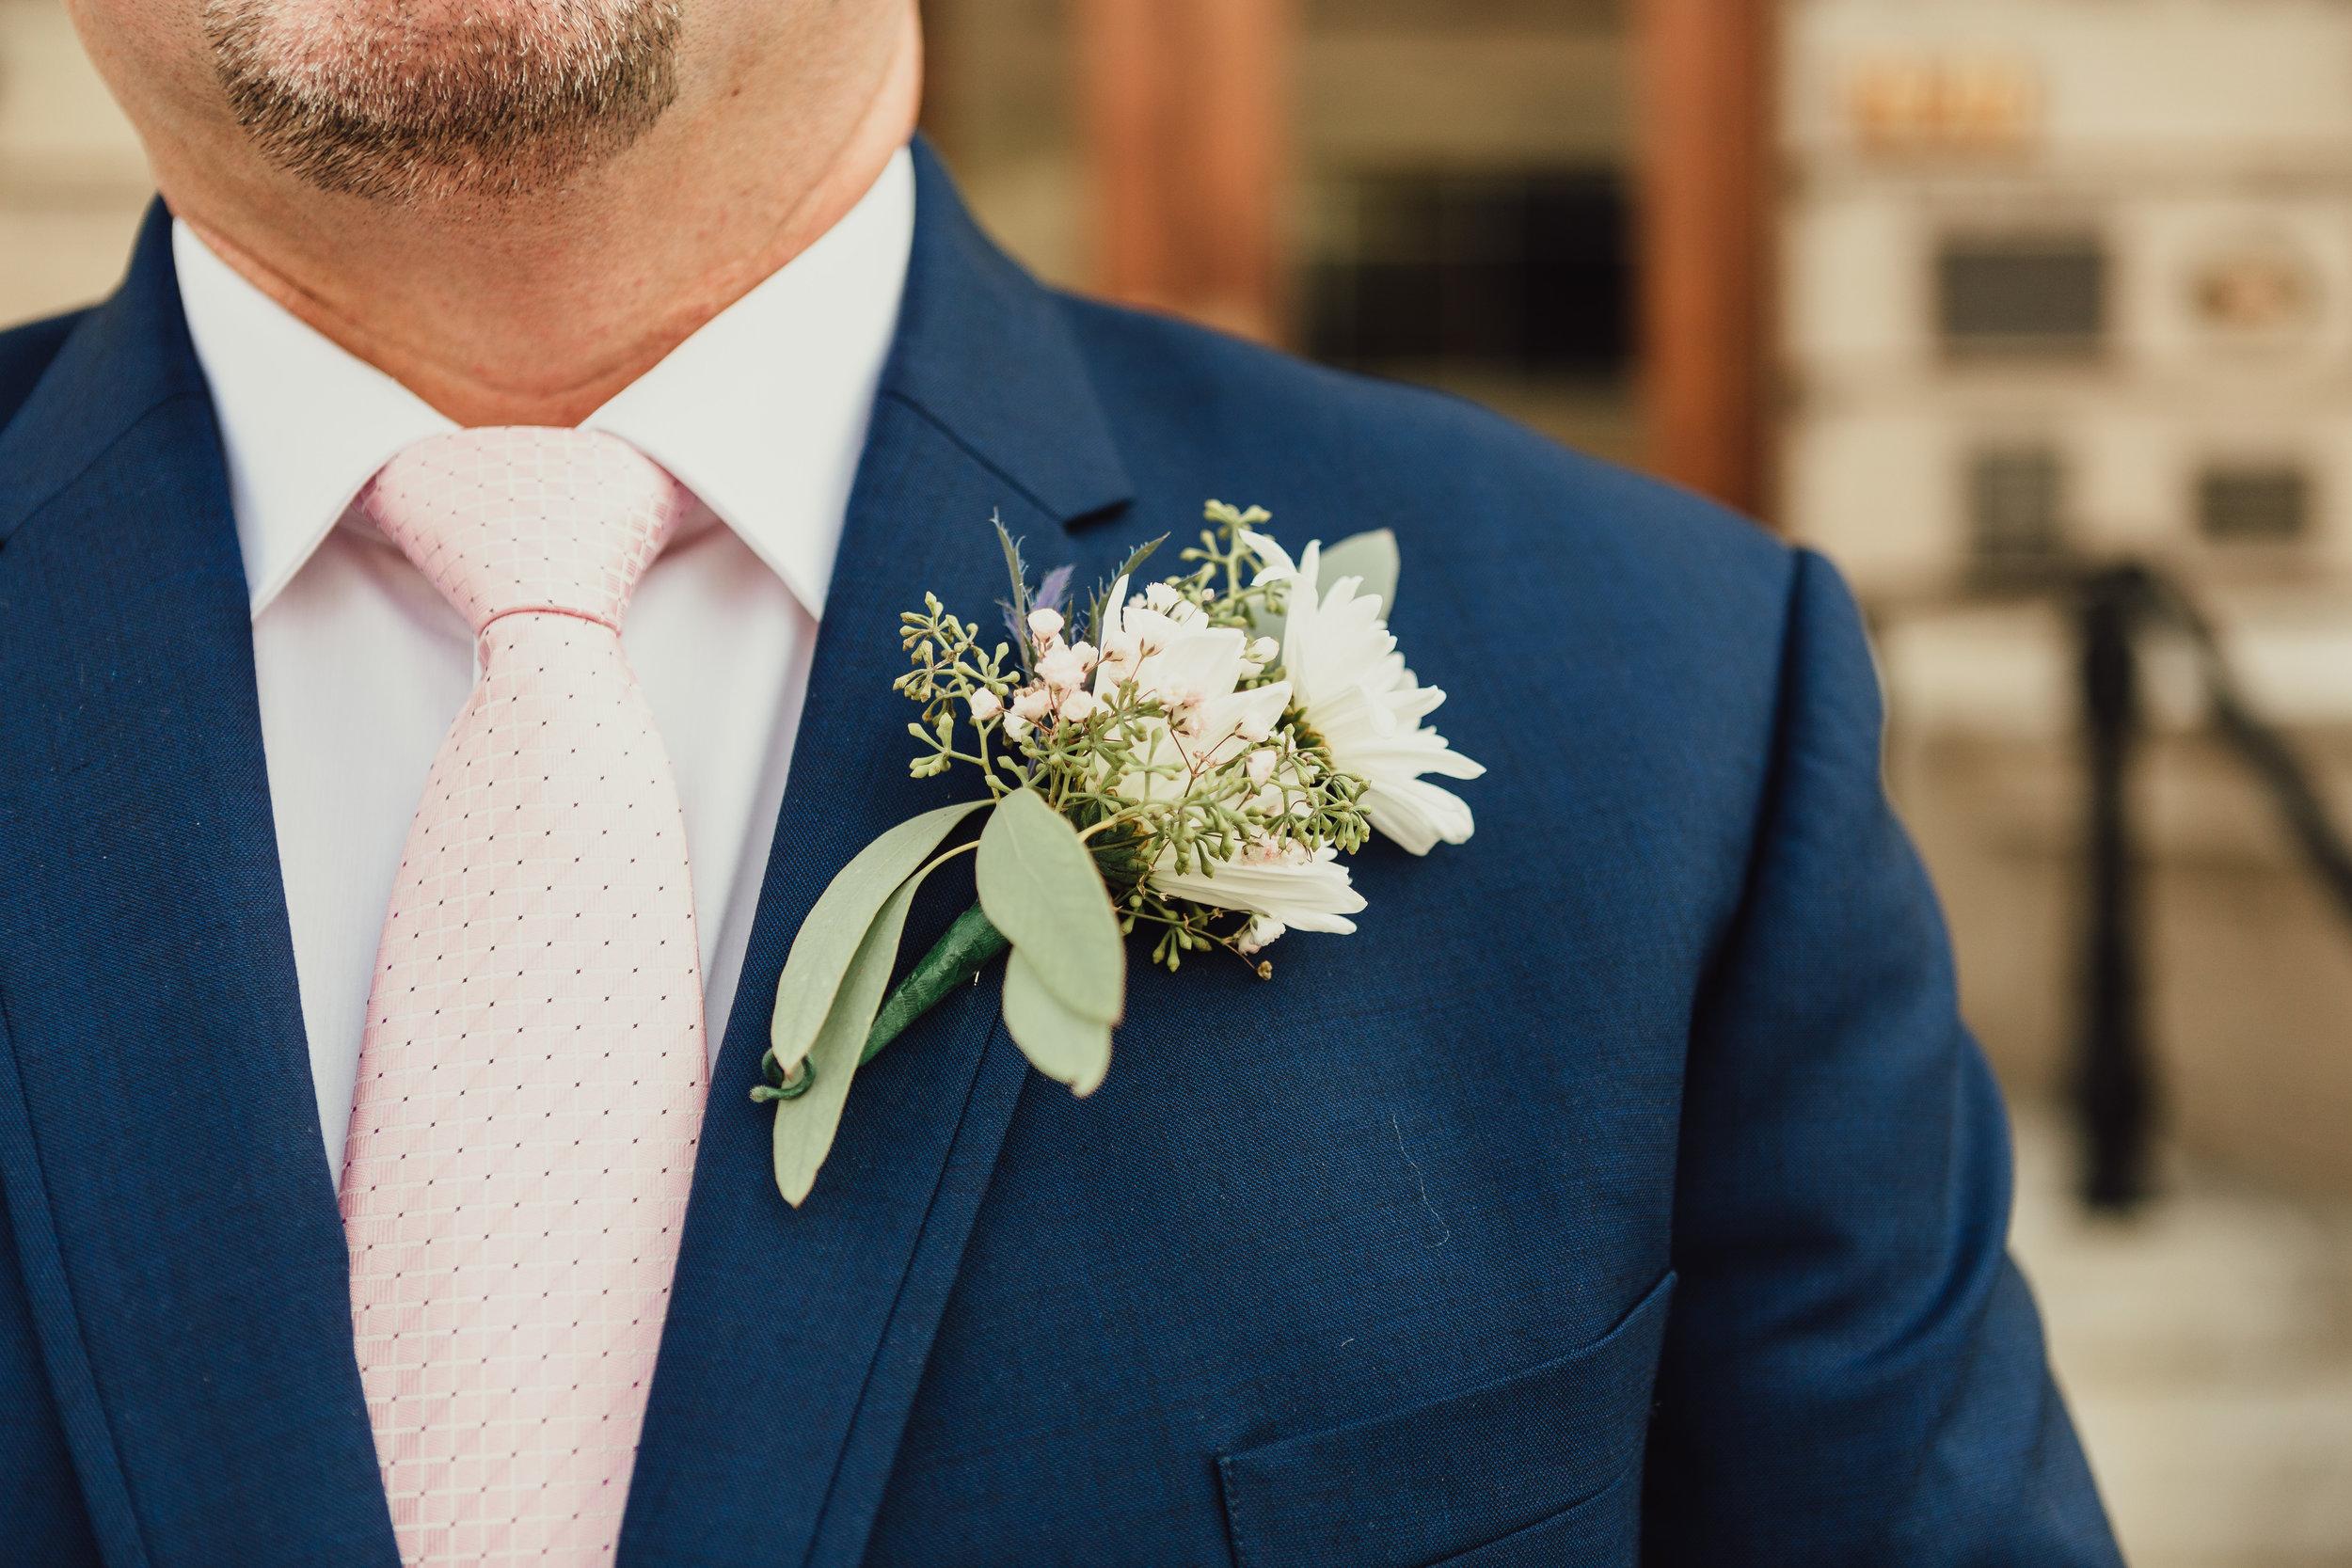 east-tn-wedding-photographer-tennessee-elopement-photographer-kingsport-tn-wedding-photographer (437 of 1001).jpg